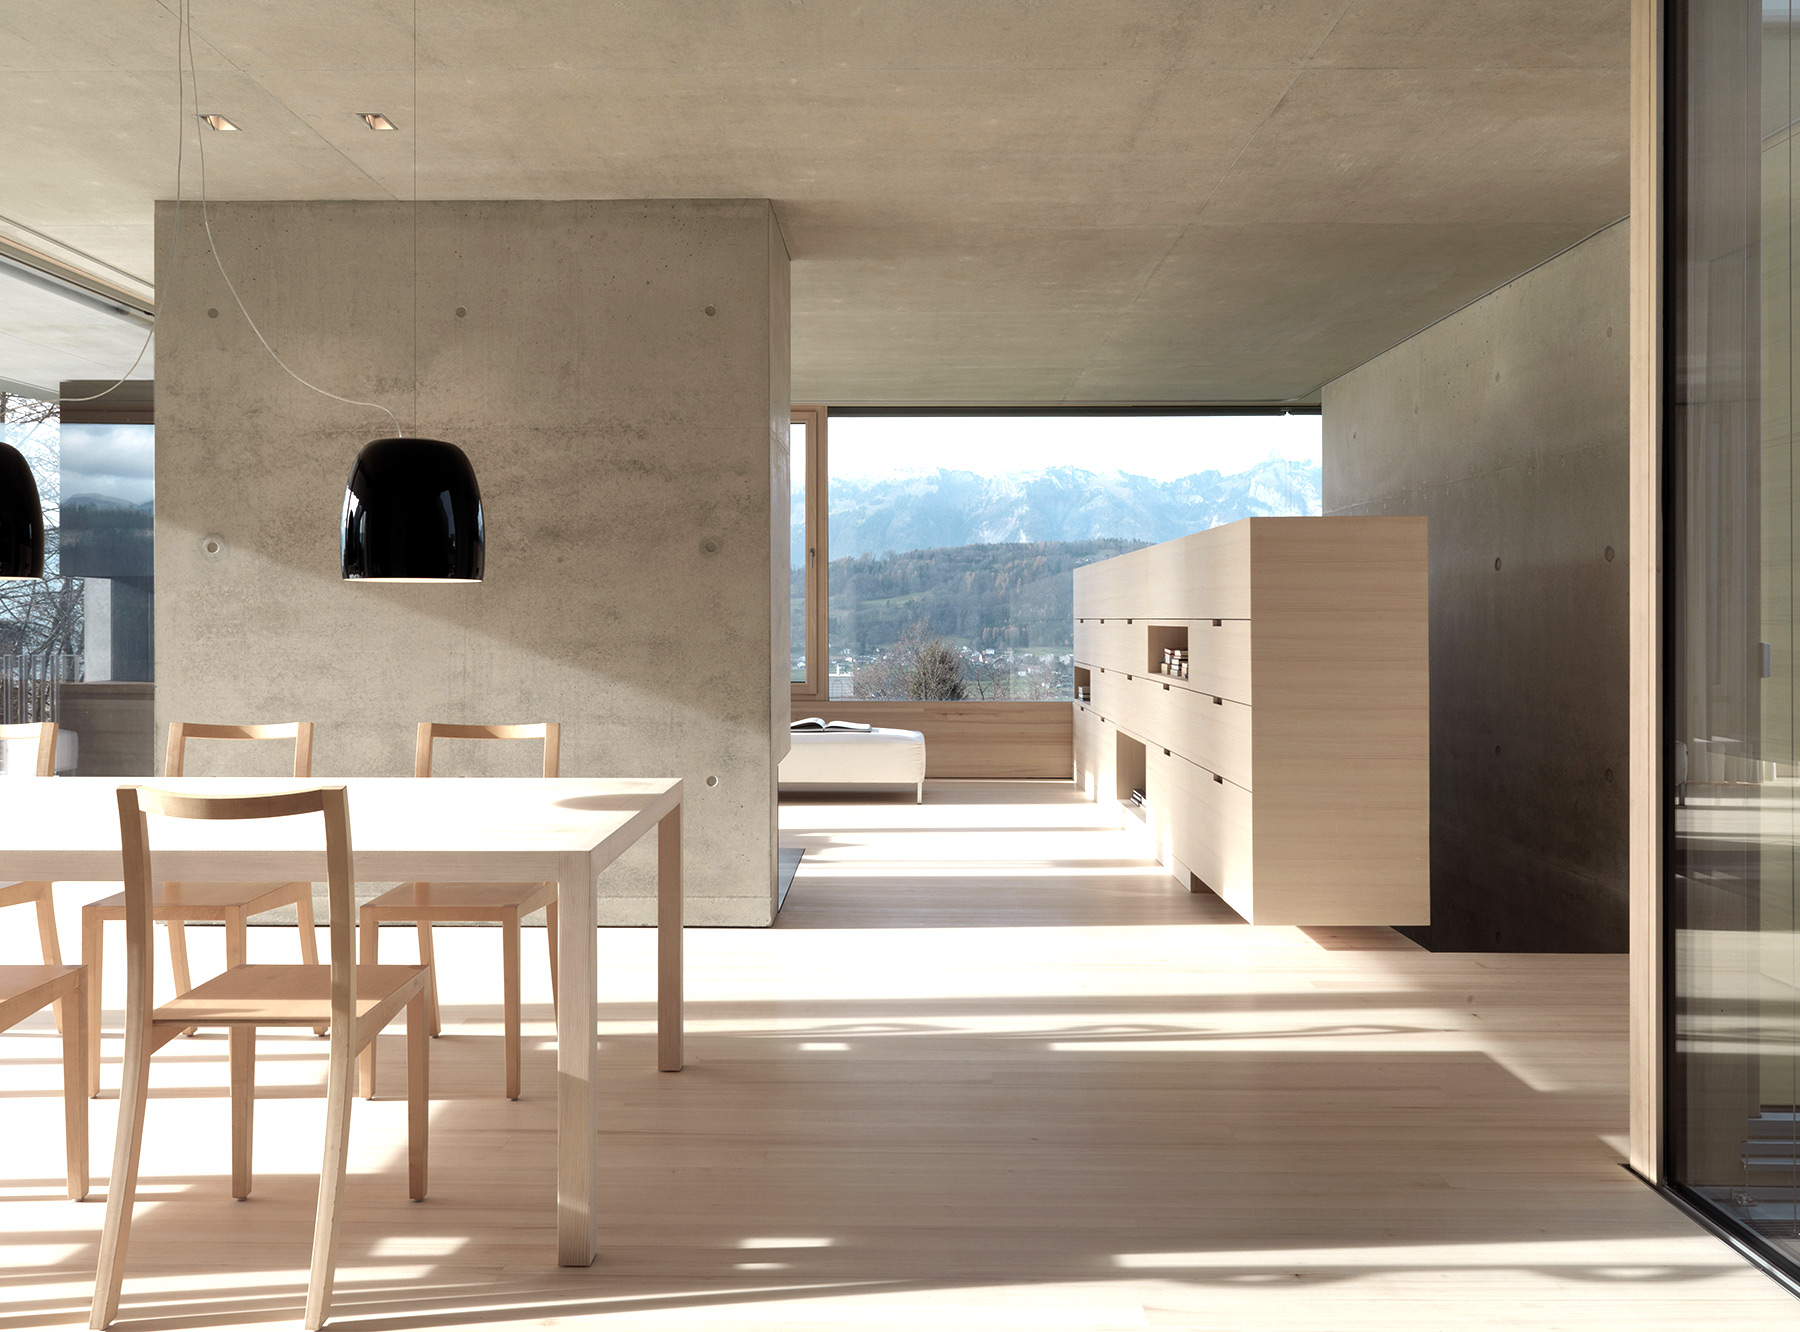 holzplanwerk haus germann vorarlberg internationaler. Black Bedroom Furniture Sets. Home Design Ideas